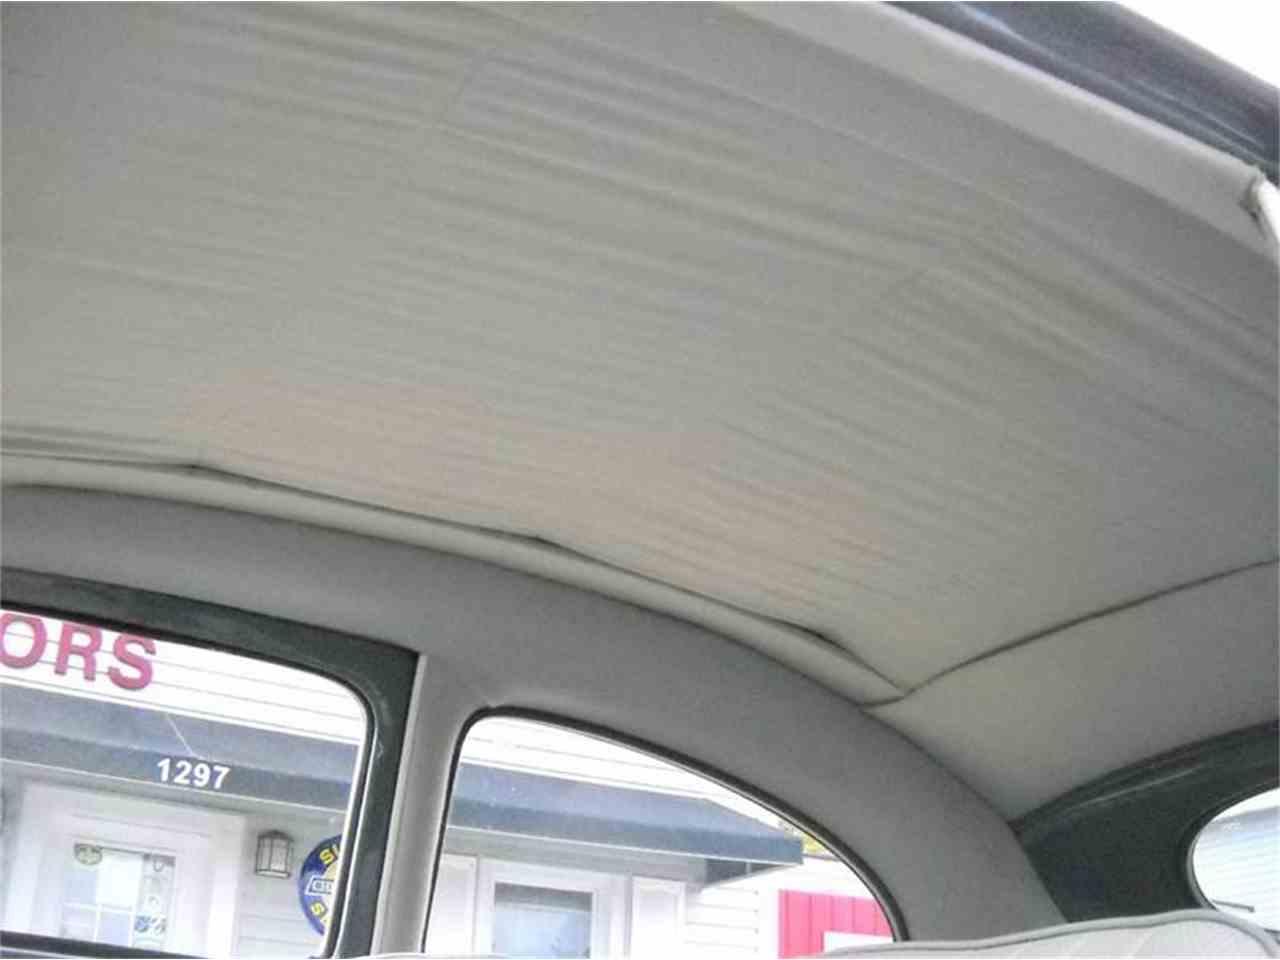 1953 Volkswagen Beetle For Sale Classiccars Com Cc 1056068